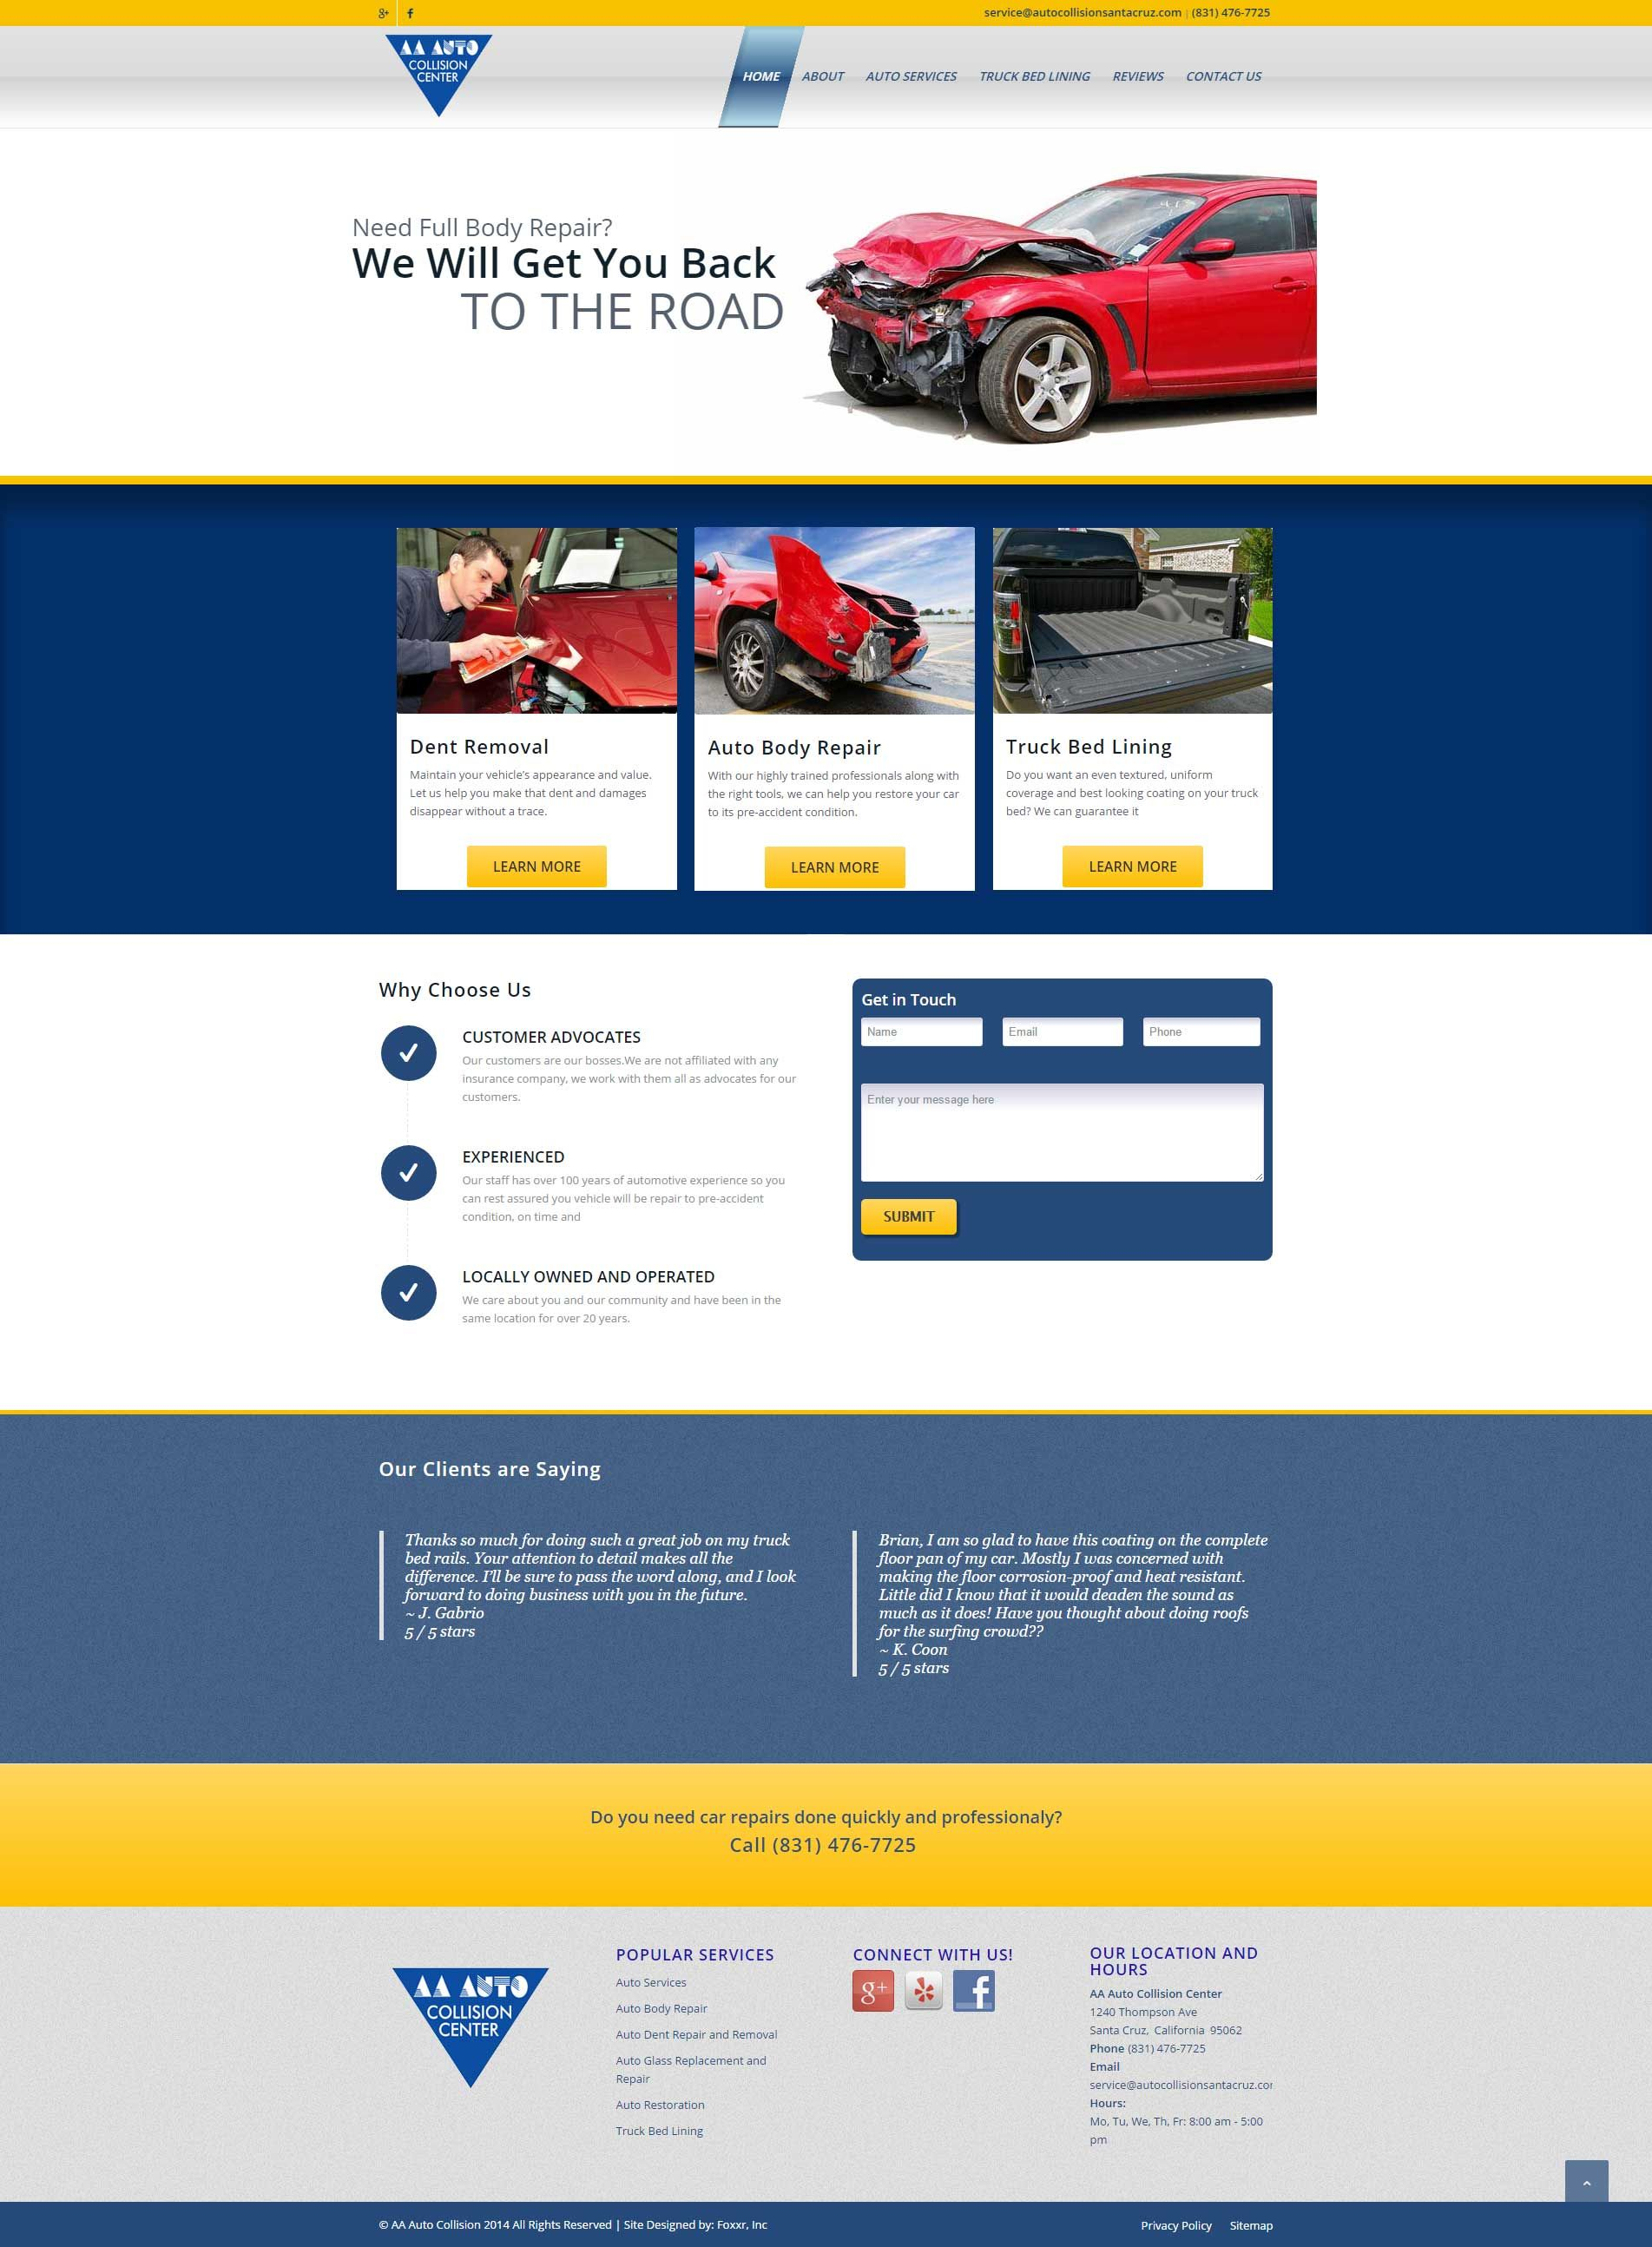 Santa Cruz Ca Web Design Local Seo Aaa Auto Foxxr Small Business Web Design Web Design Web Design Services